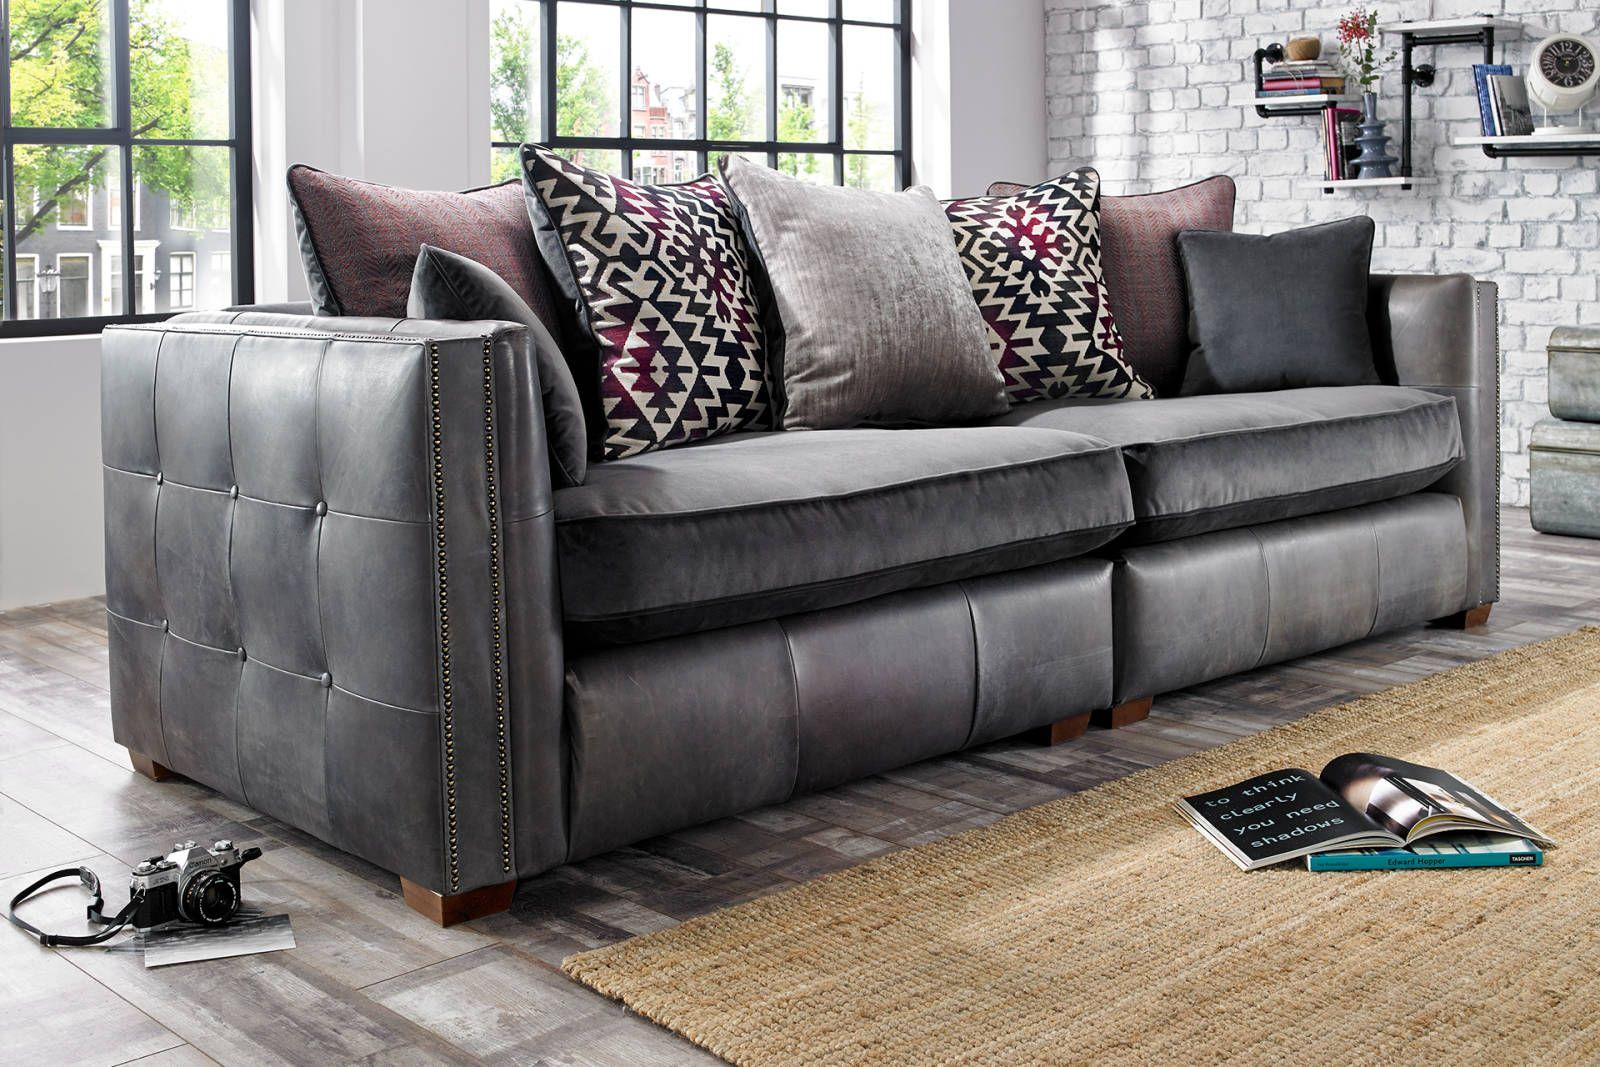 Fulham Sofology Sofa Home Decor Furniture